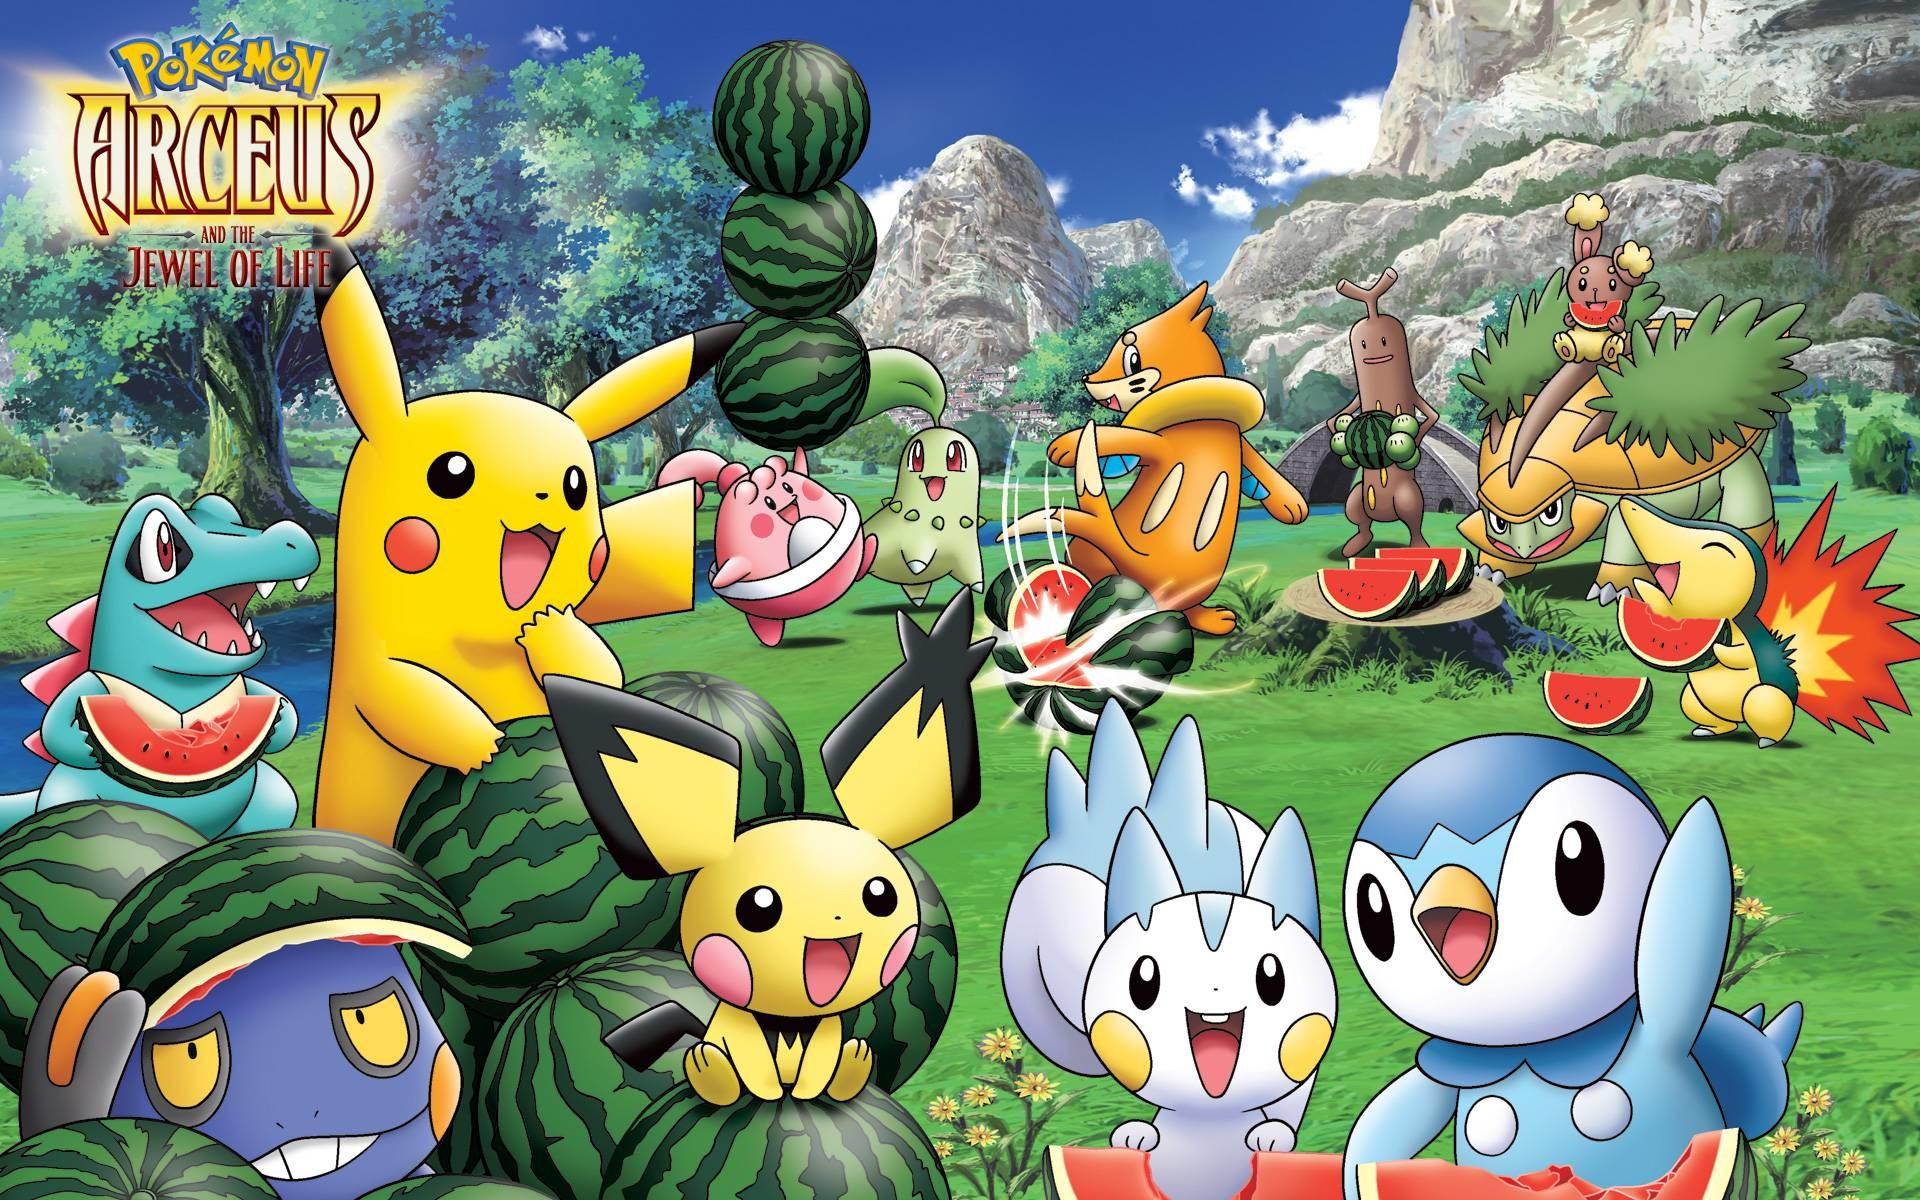 Pokemon desktop wallpapers – Very popular Anime TV show